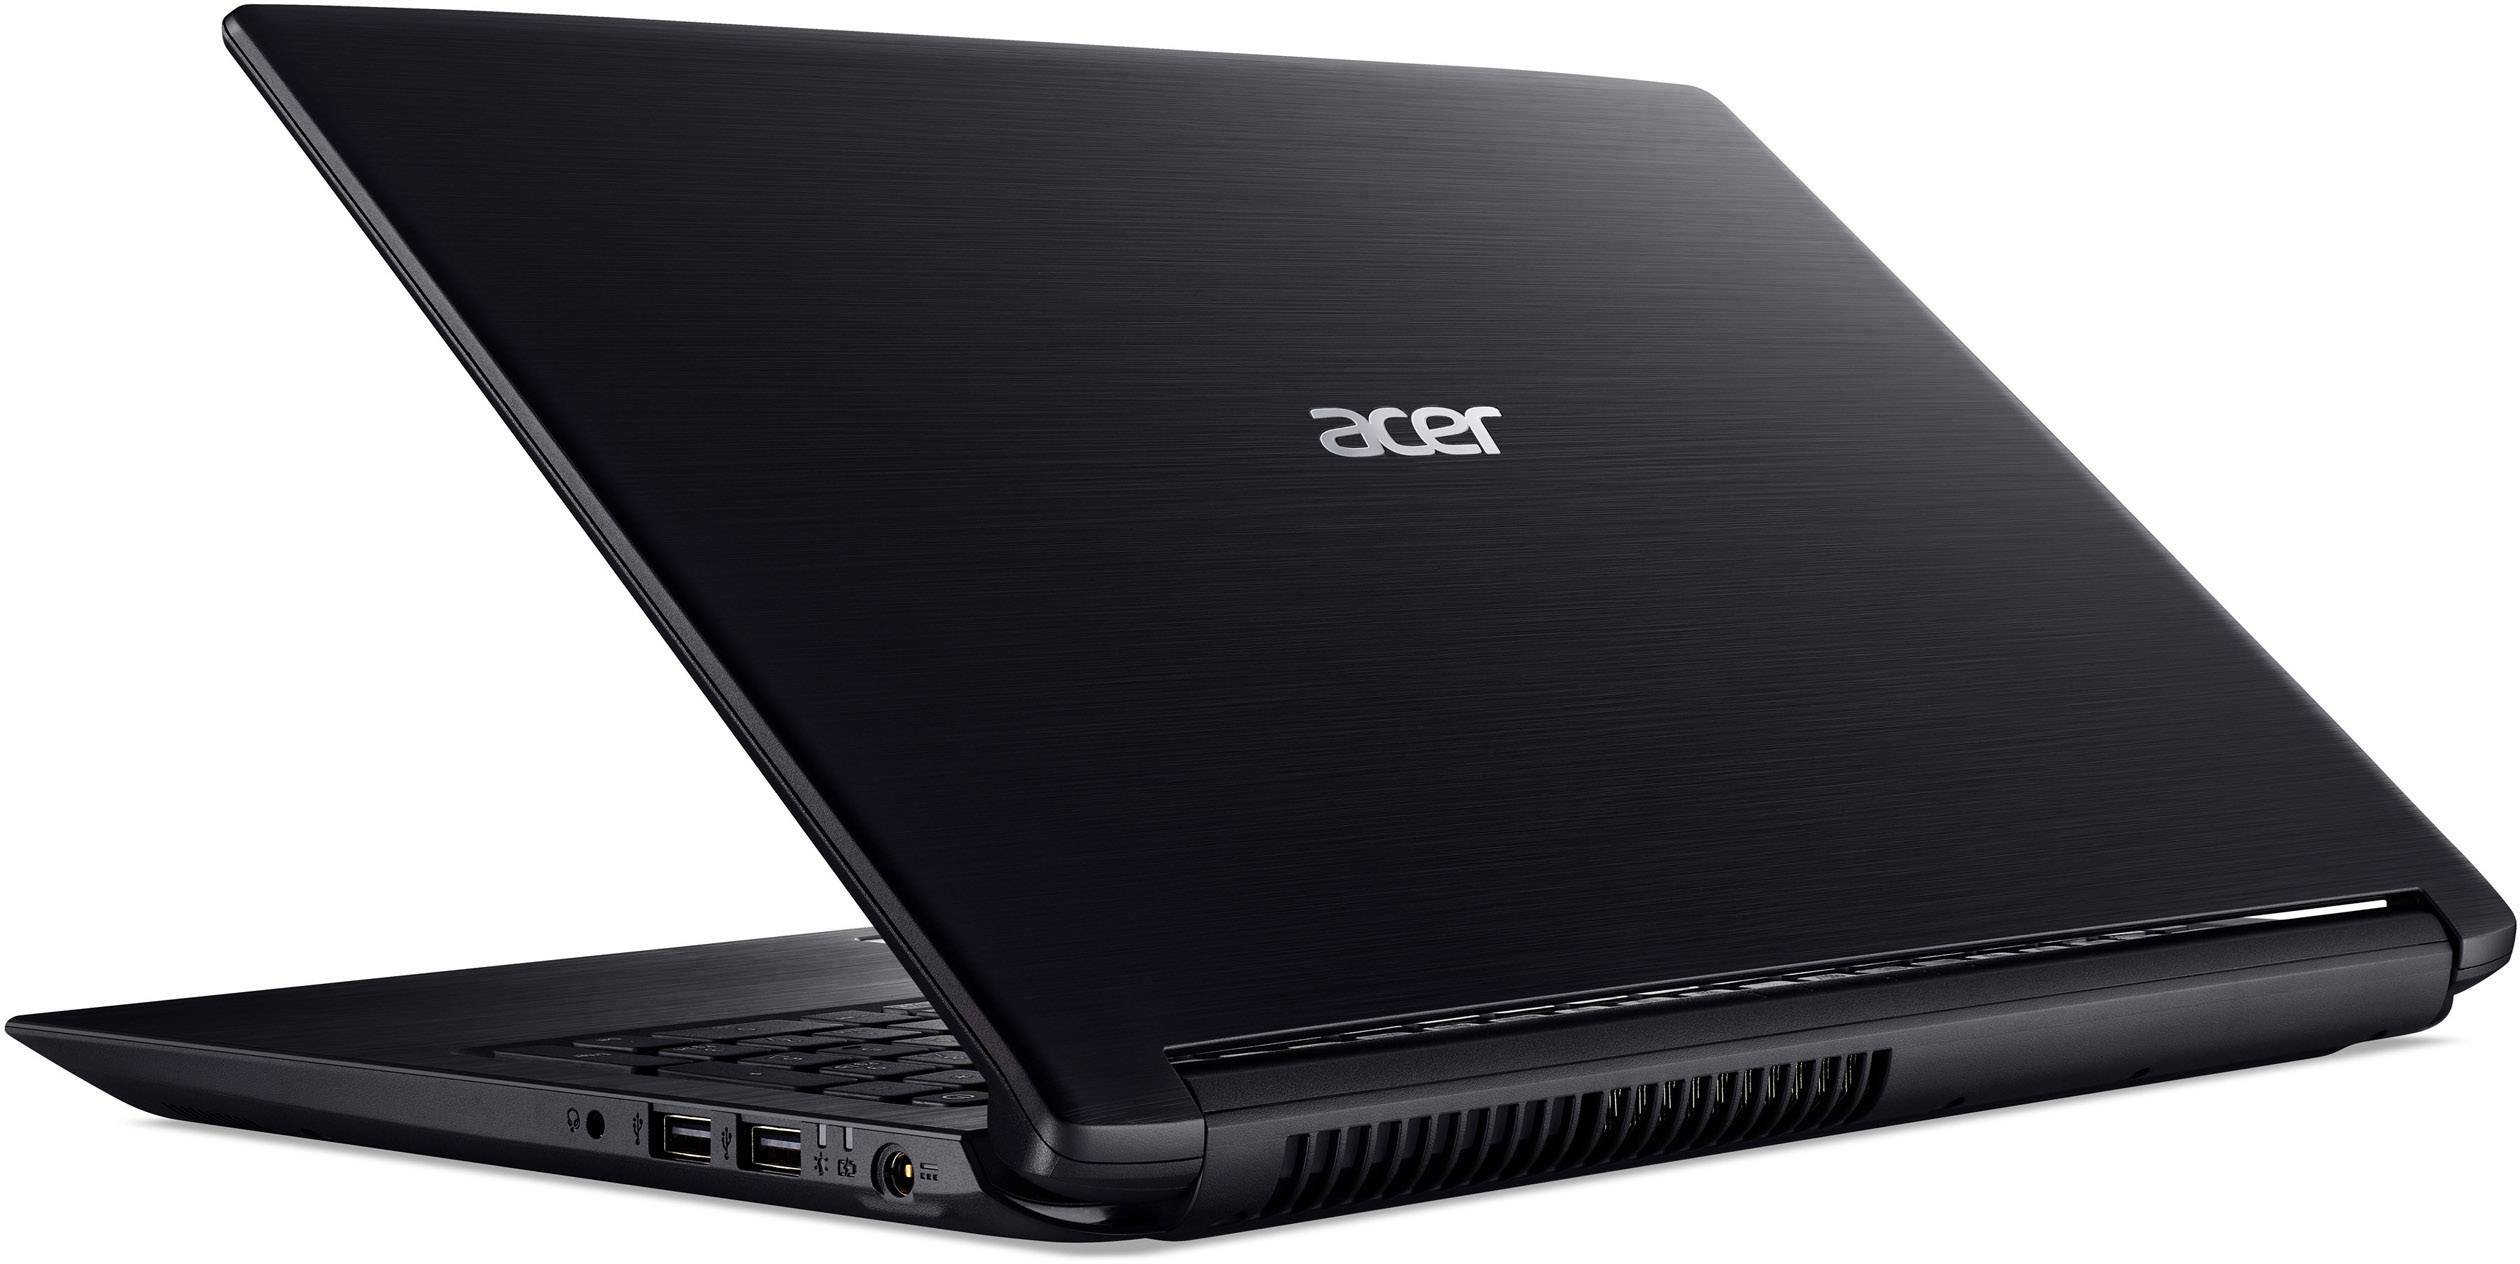 Acer Aspire 3 A315 21 9875 Laptop Amd A9 9420e 6 Gb 256 Gb Ssd Amd Radeon R5 Conrad Com